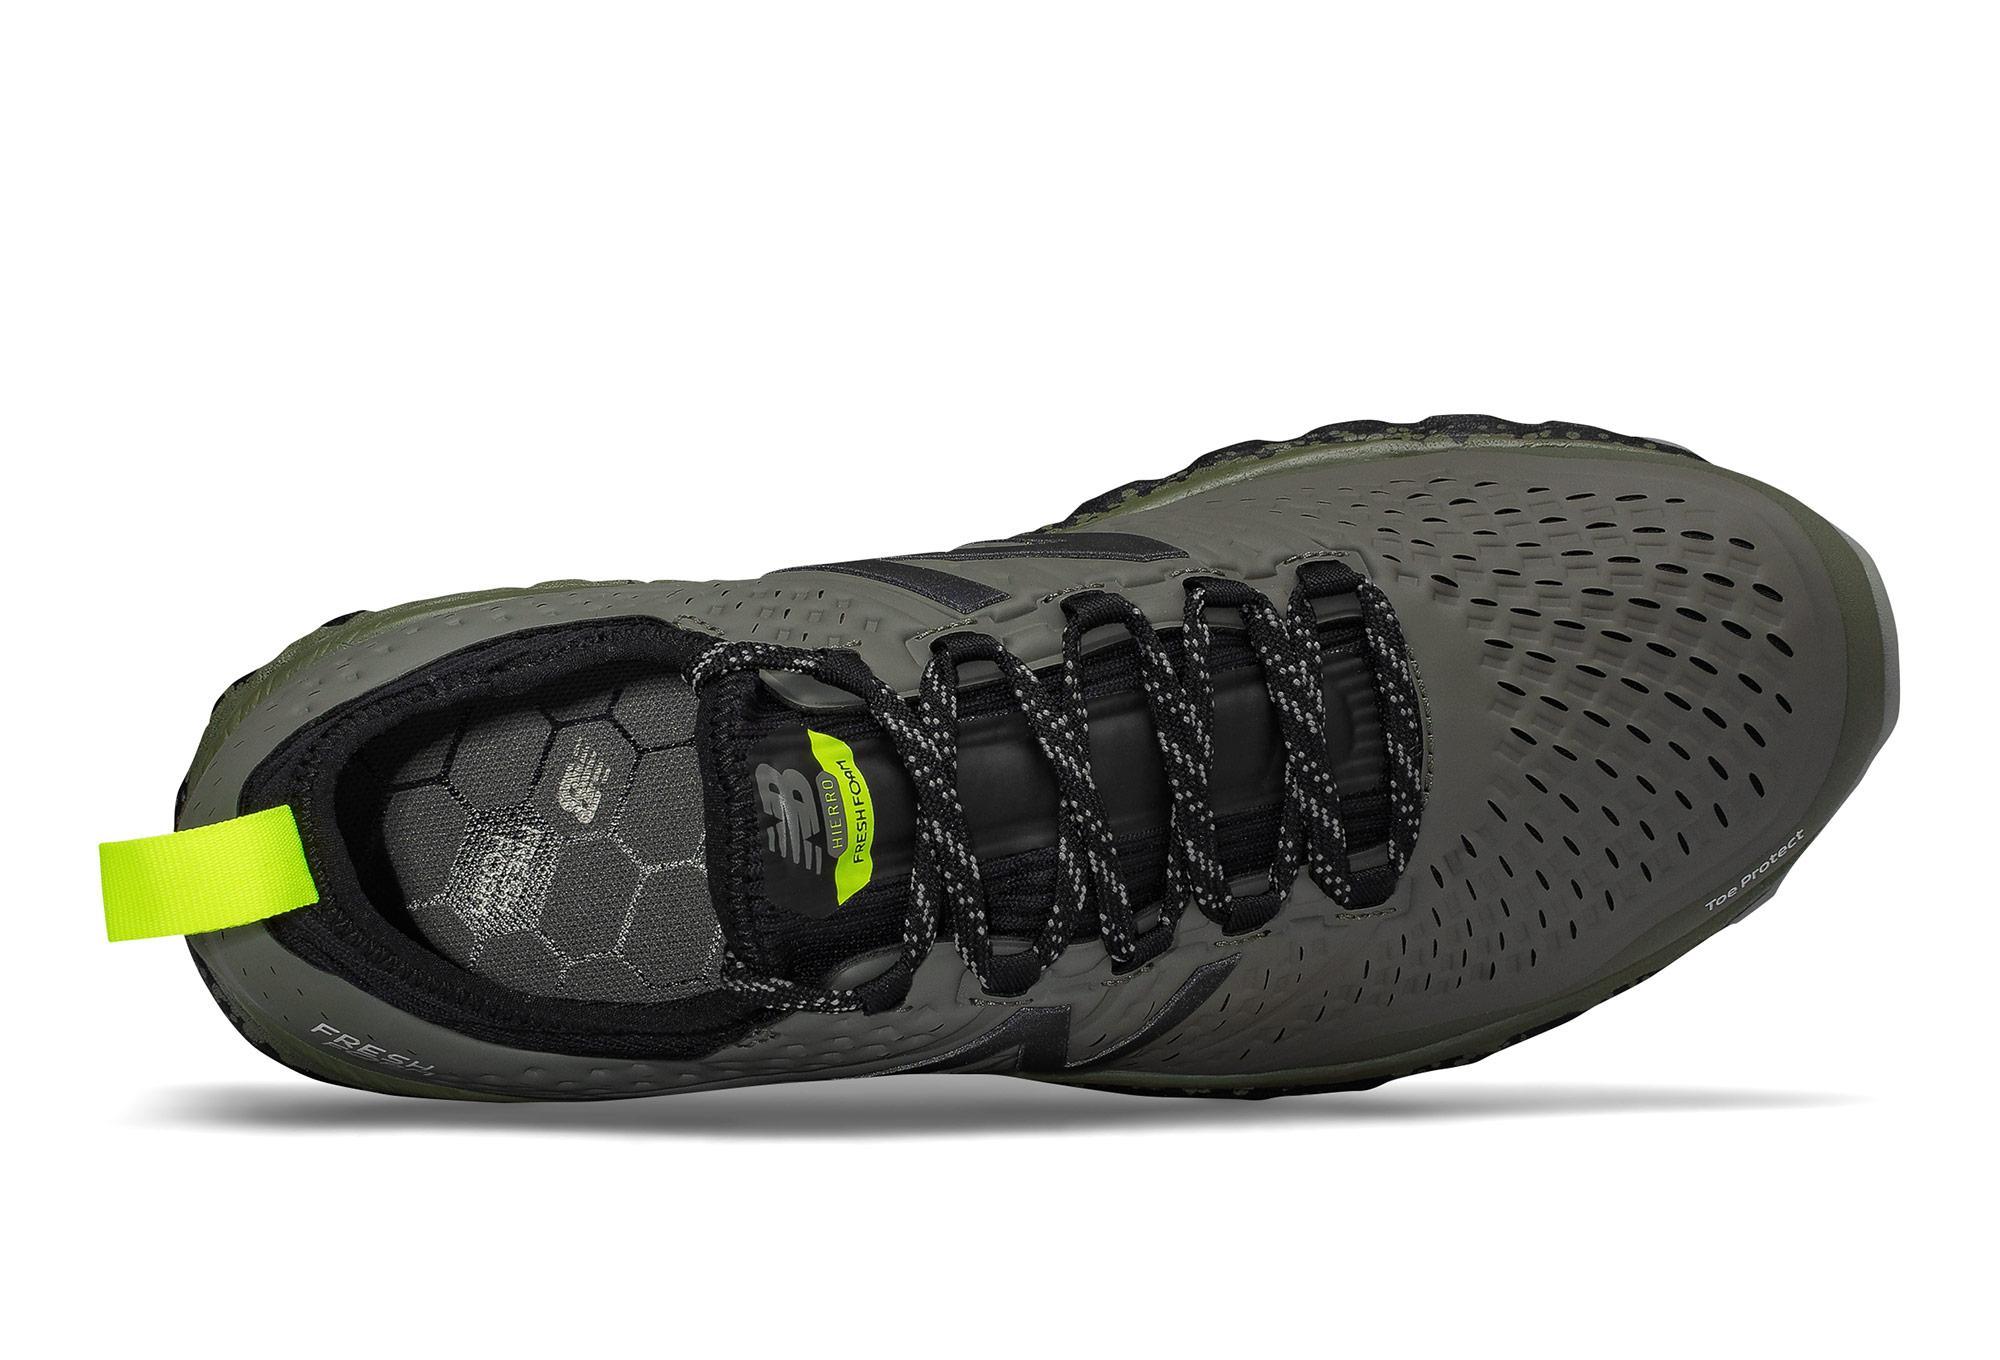 Hierro New V3 Running Fresh Scarpe Trail Foam Da Balance Verde EHW9D2I